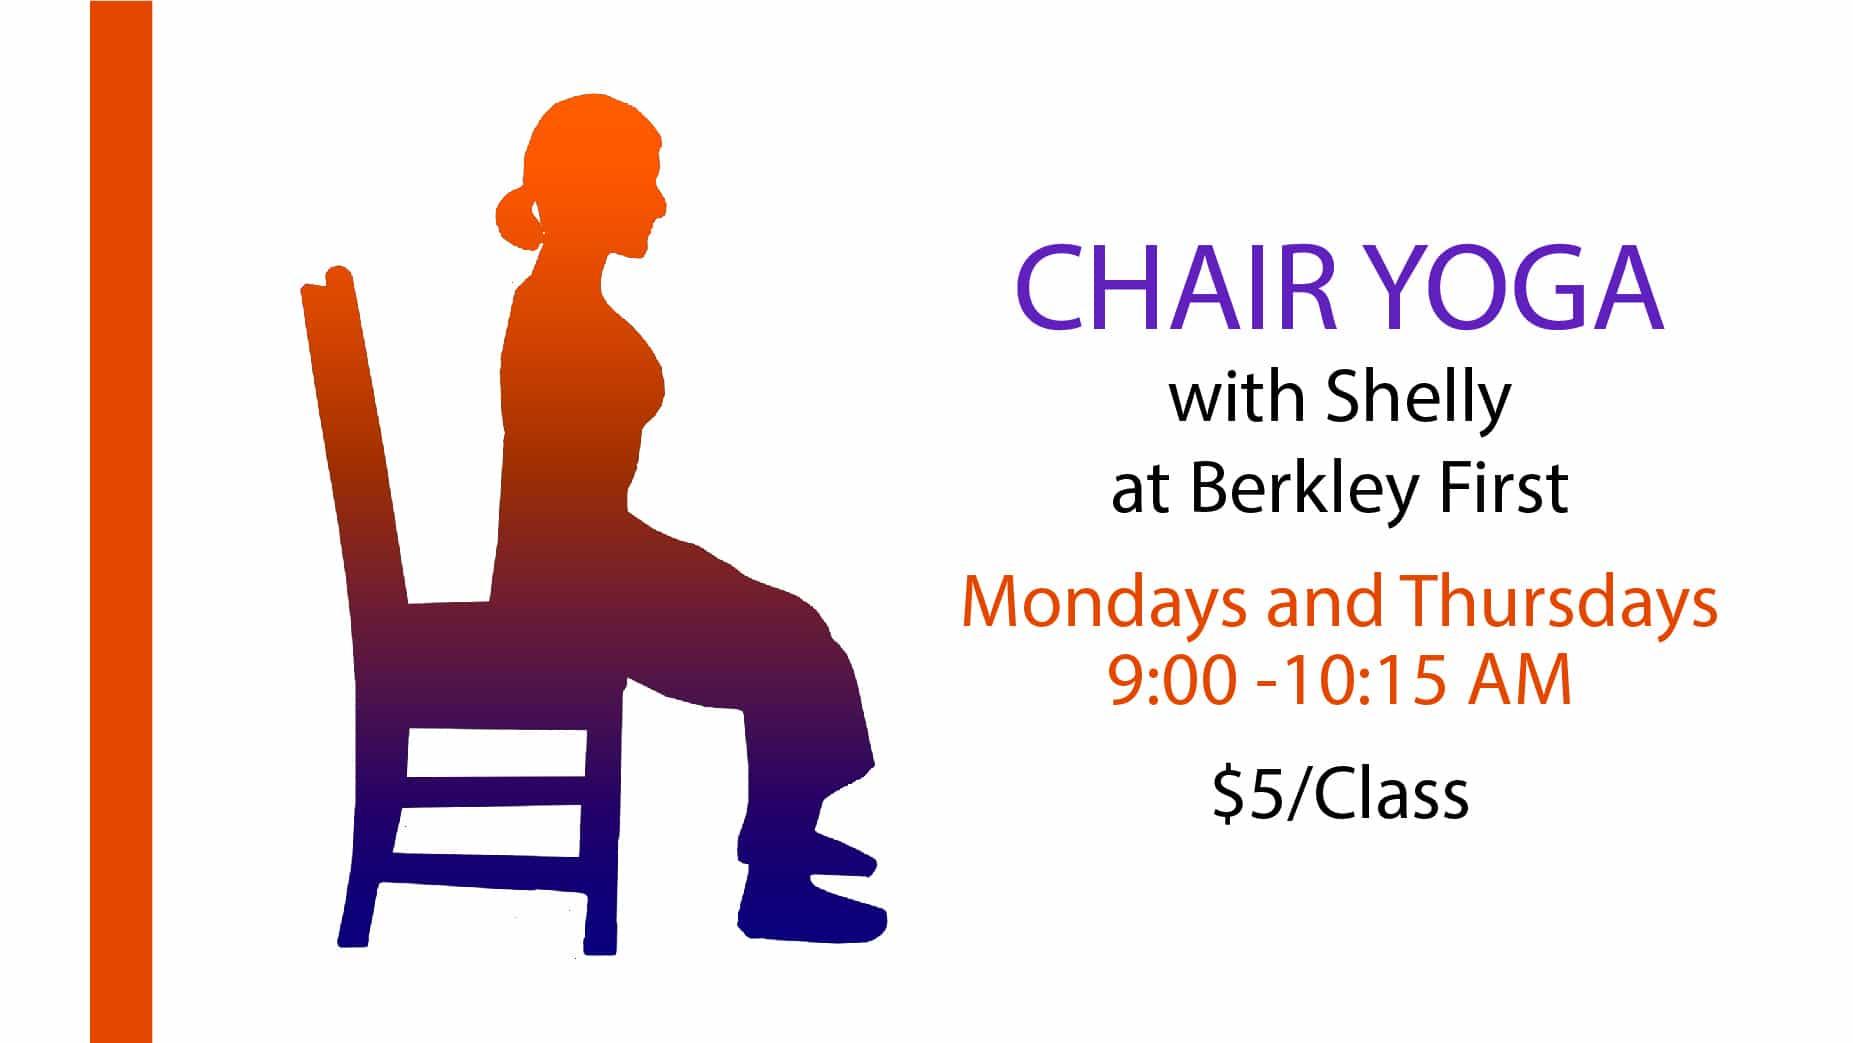 Chair Yoga Berkley First